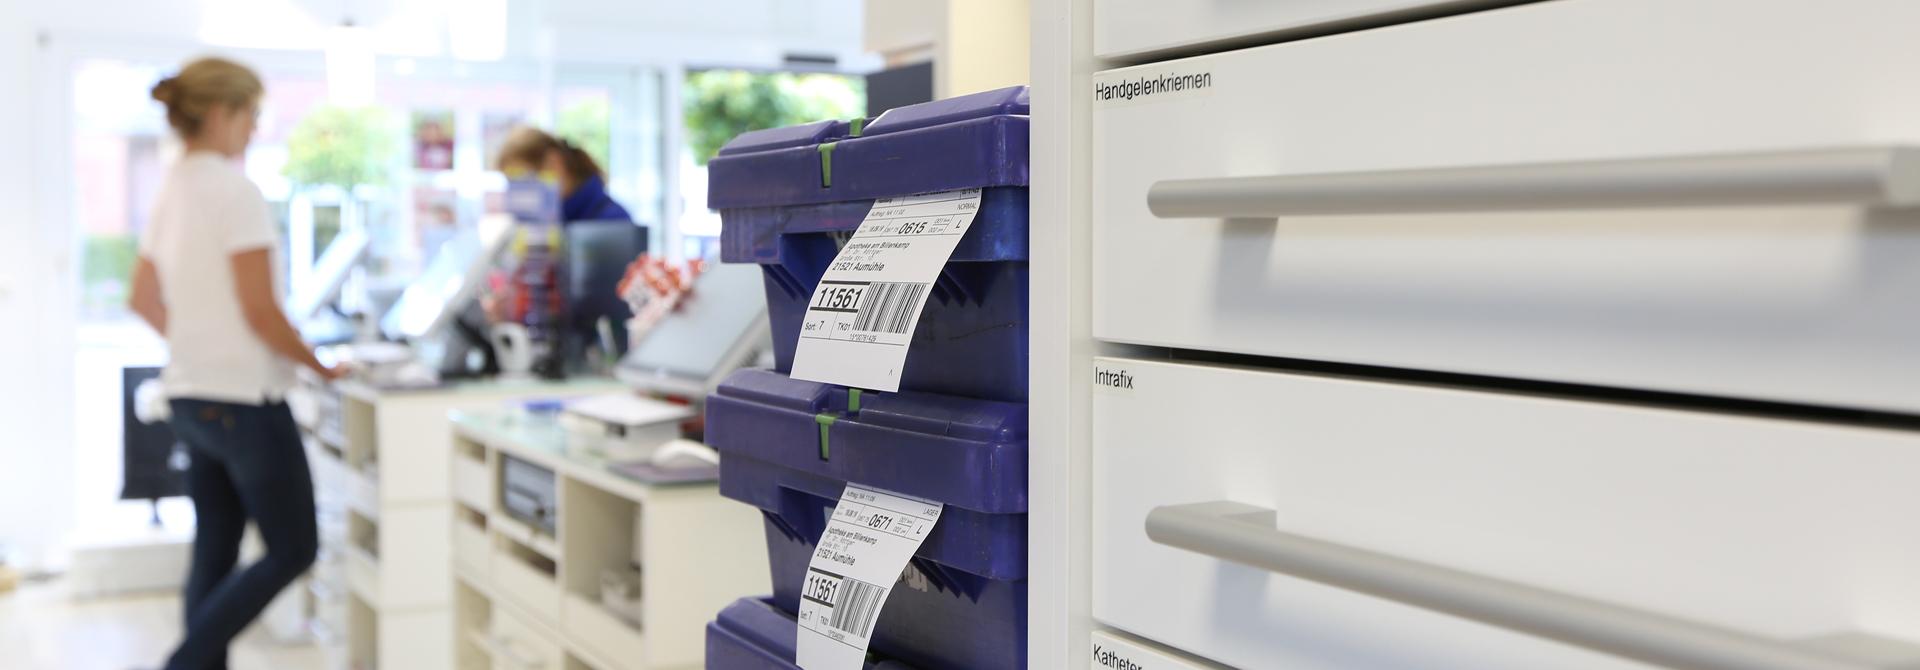 Apotheke am Billenkamp, Große Straße 10 21521 Aumühle, Dr. Thomas Röttger, Beratung, Kompetenz, Service.